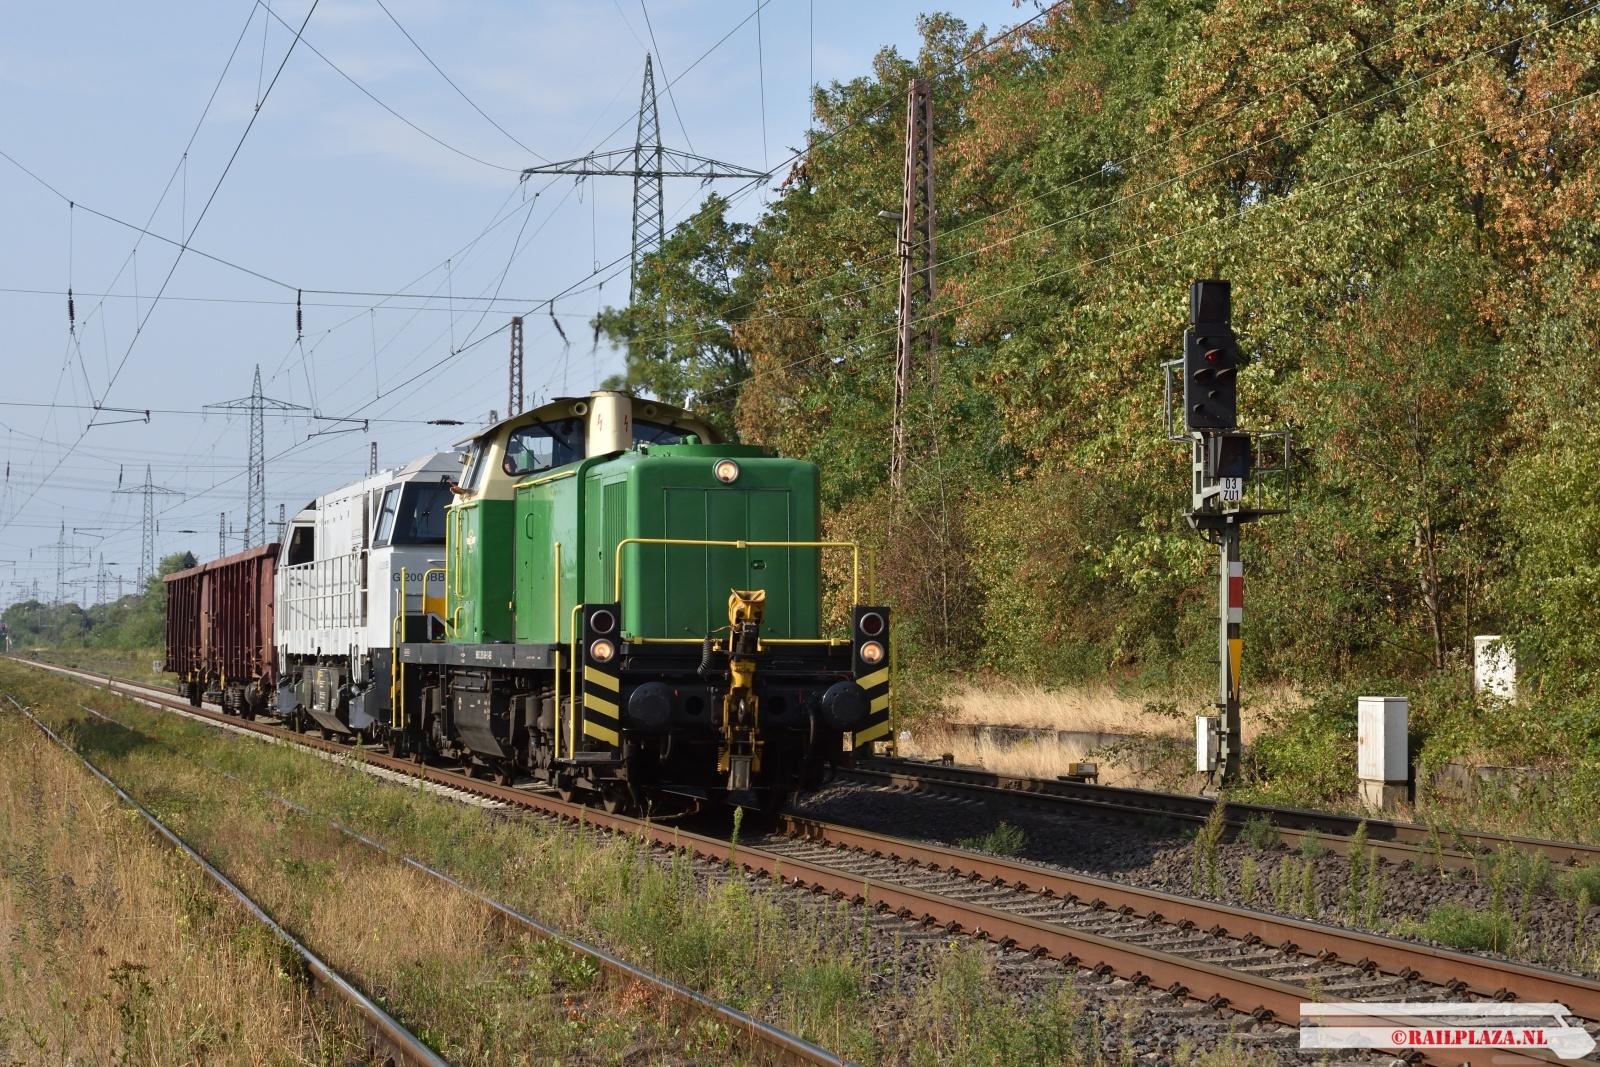 295 049 - Lintorf